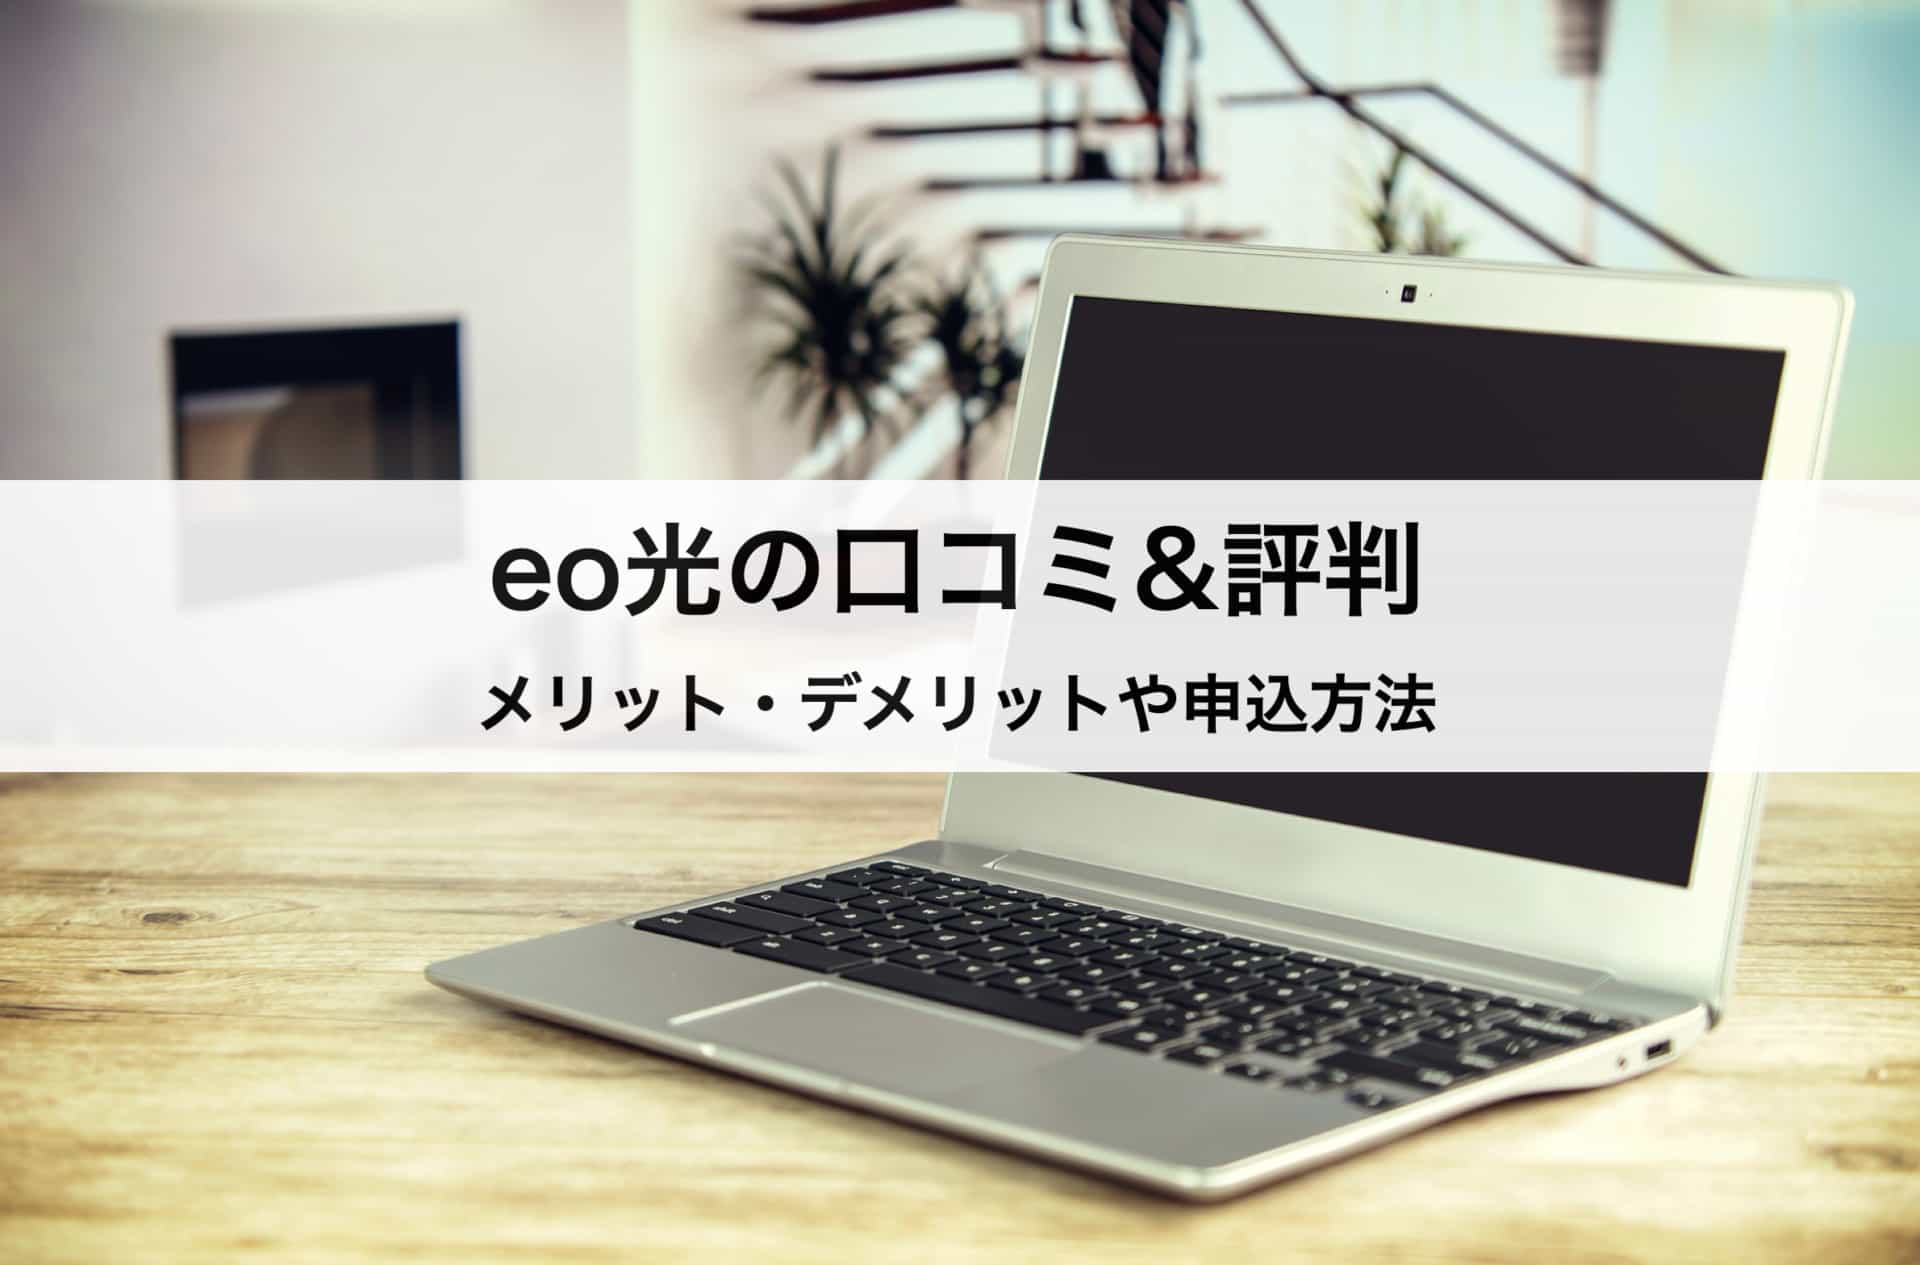 eo(イオ)光の口コミ&評判|メリット・デメリットや申込方法まで徹底解説!